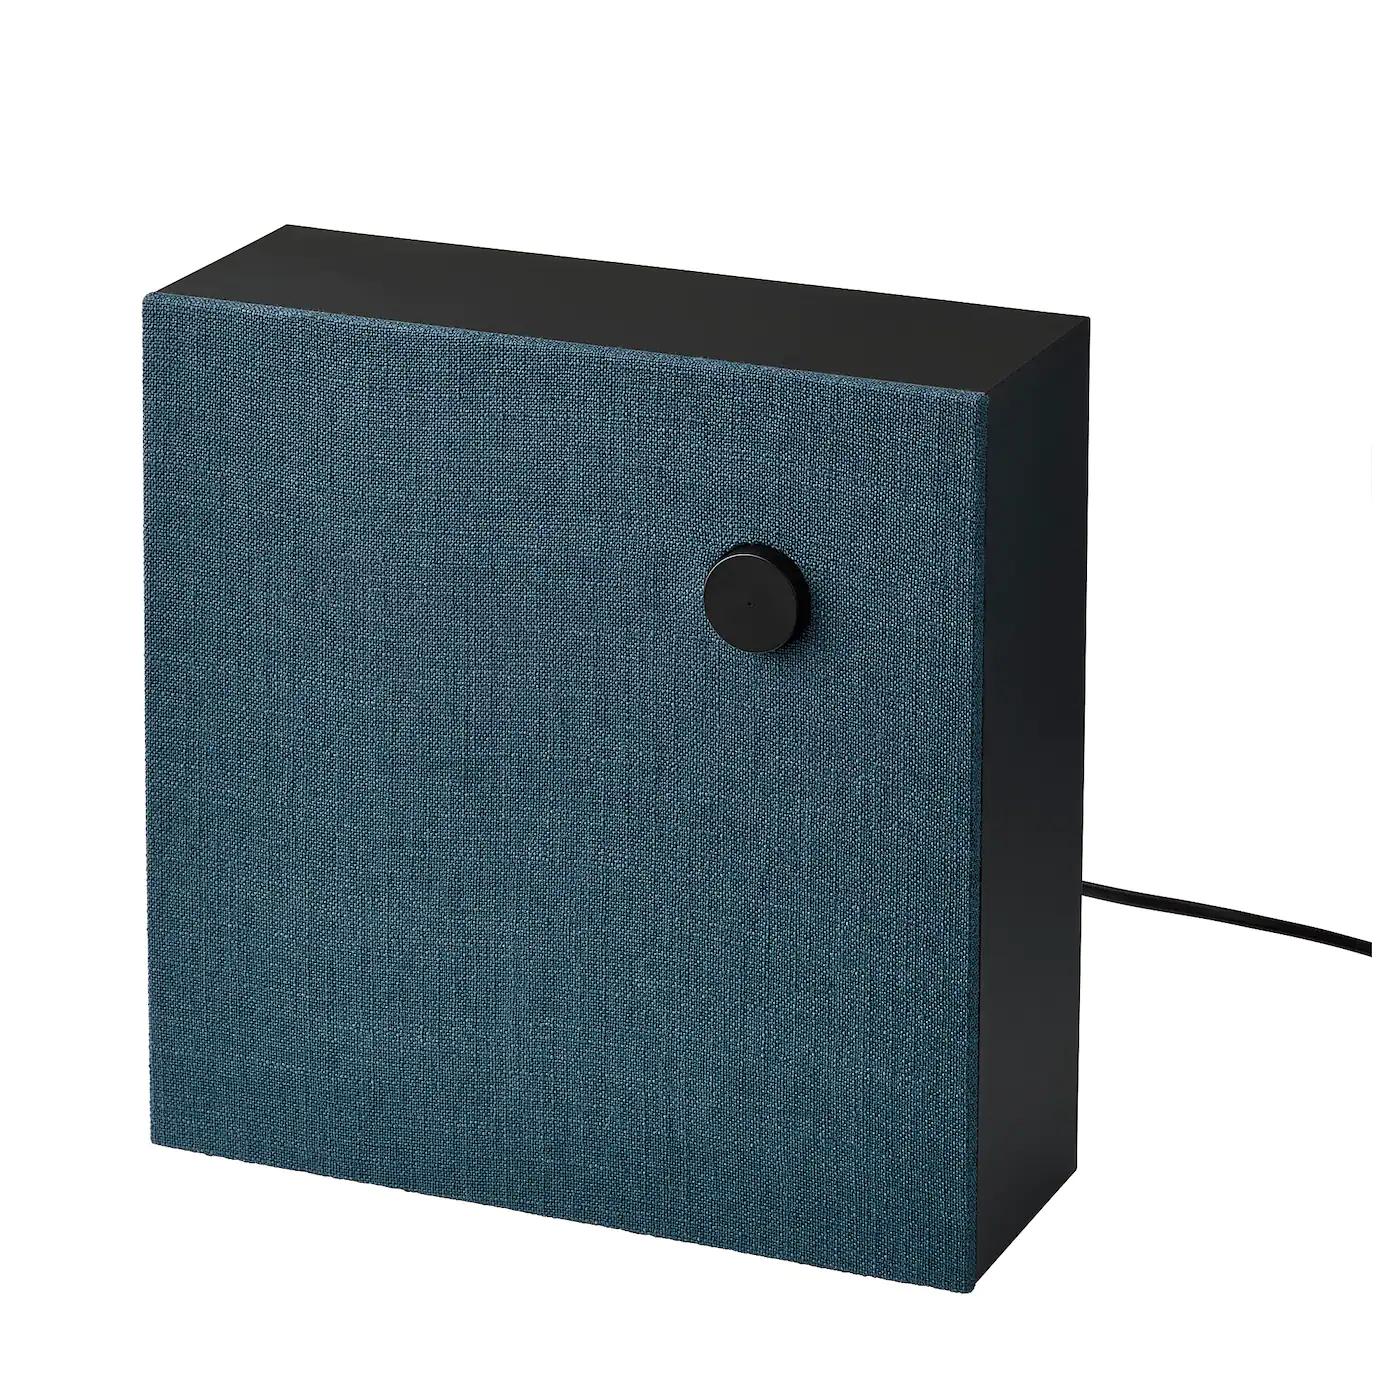 ENEBY bluetooth speaker 30x30cm white £30 @ Ikea (Nottingham)